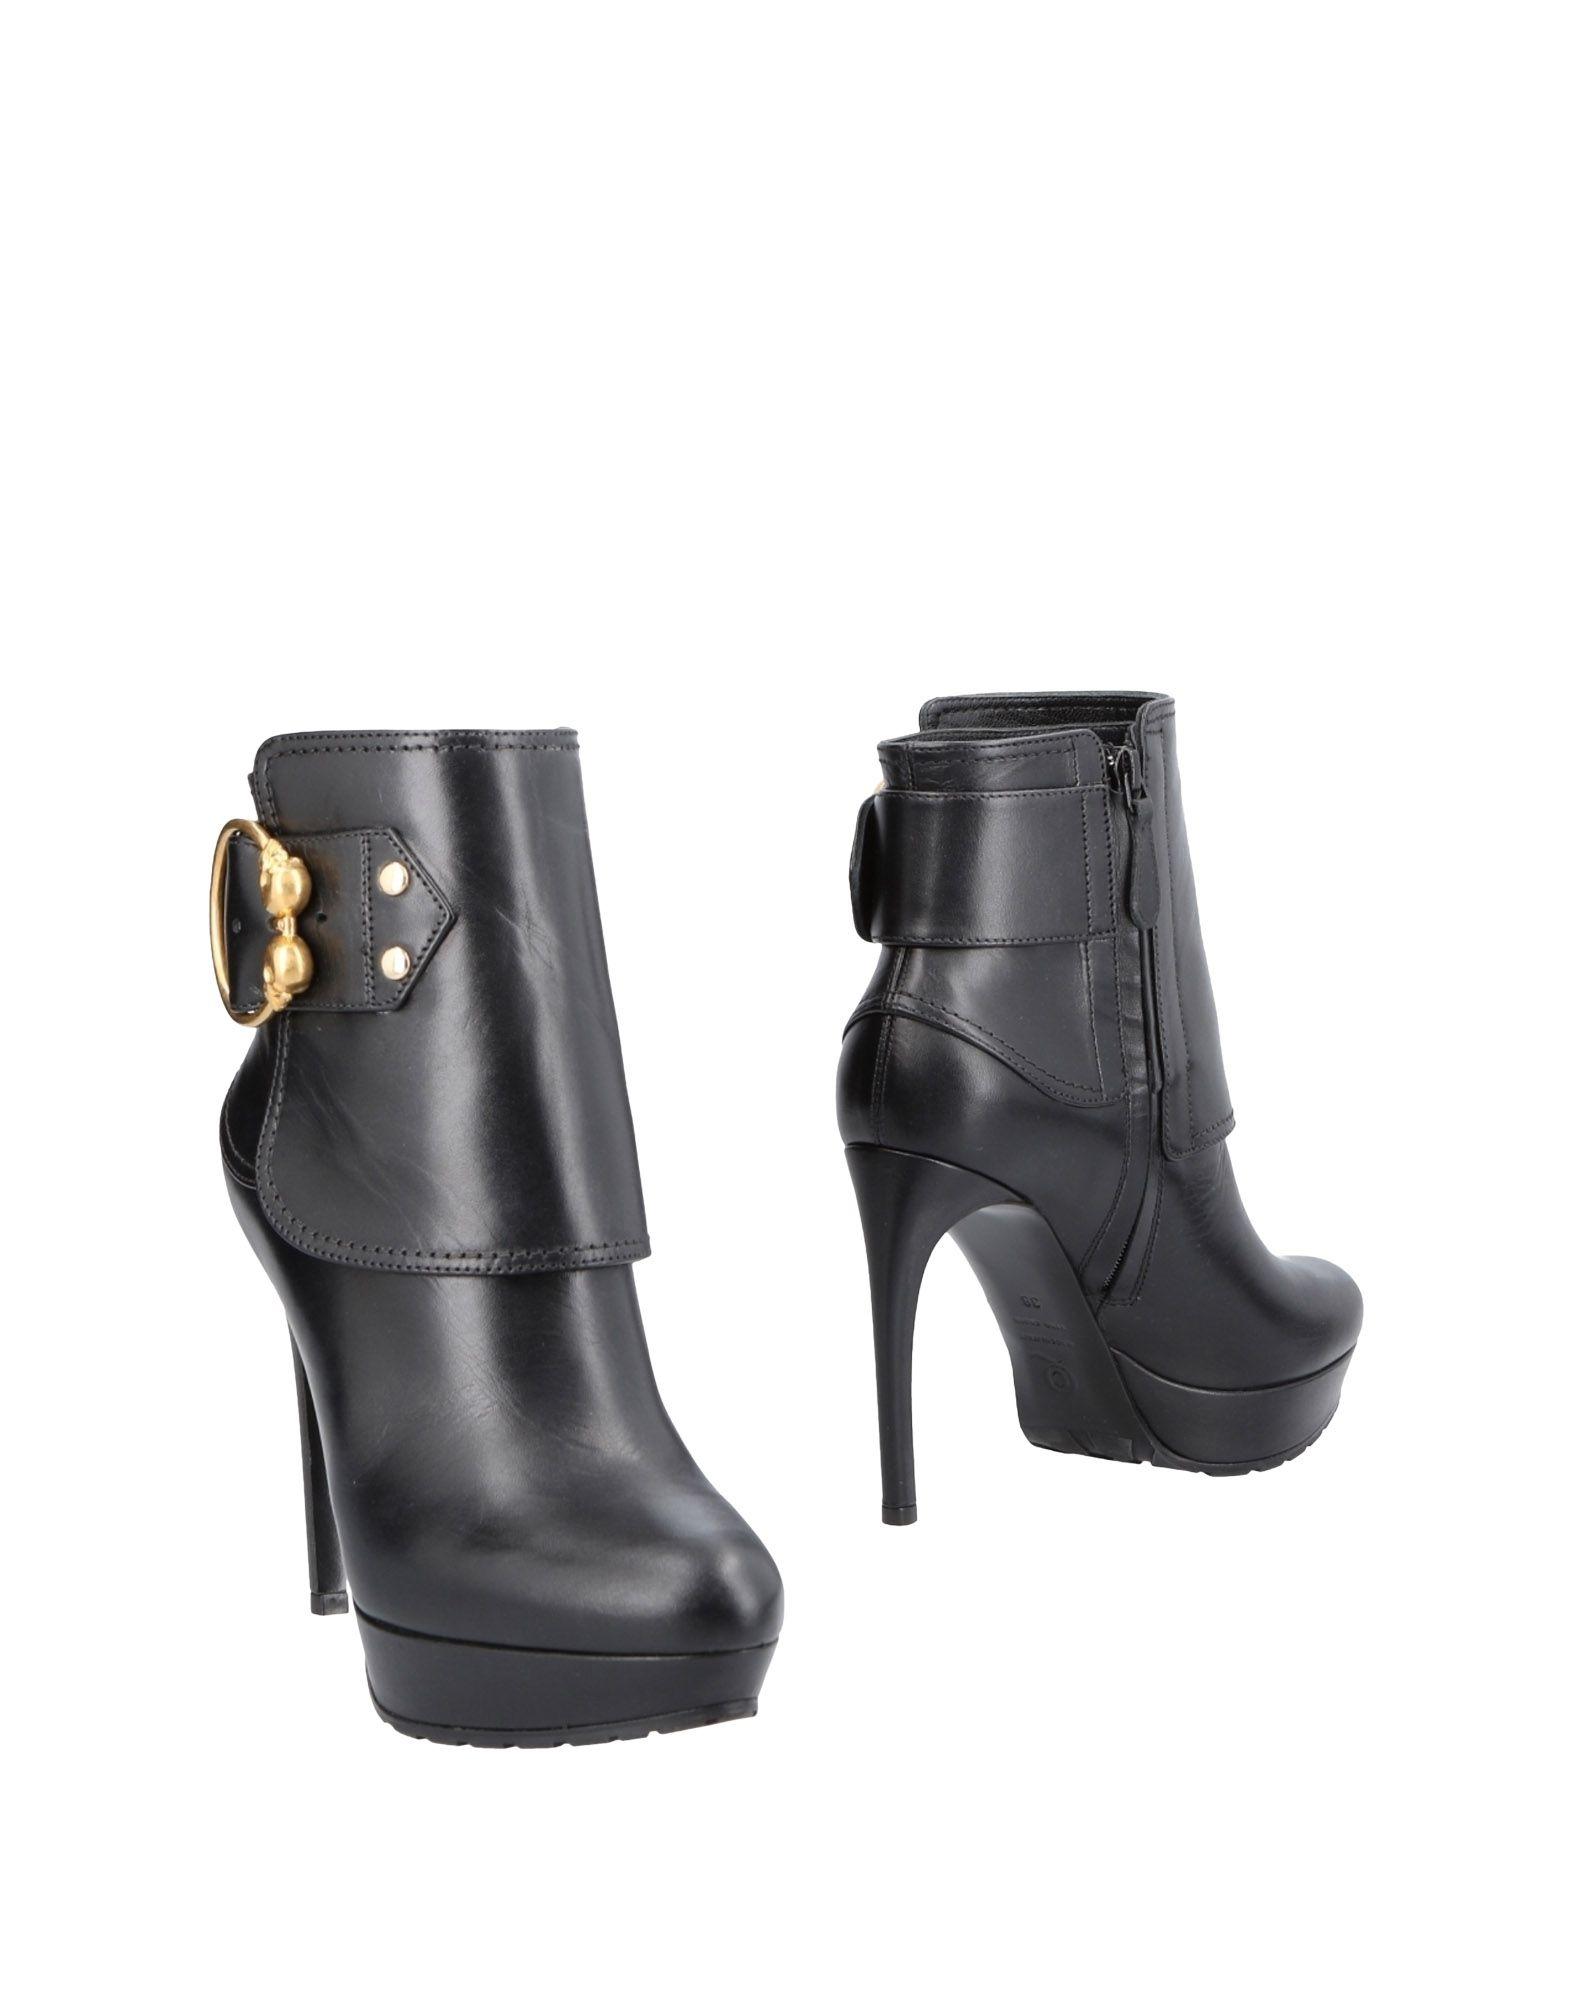 Bottine Alexander Mcqueen Femme - Bottines Alexander Mcqueen Noir Chaussures casual sauvages